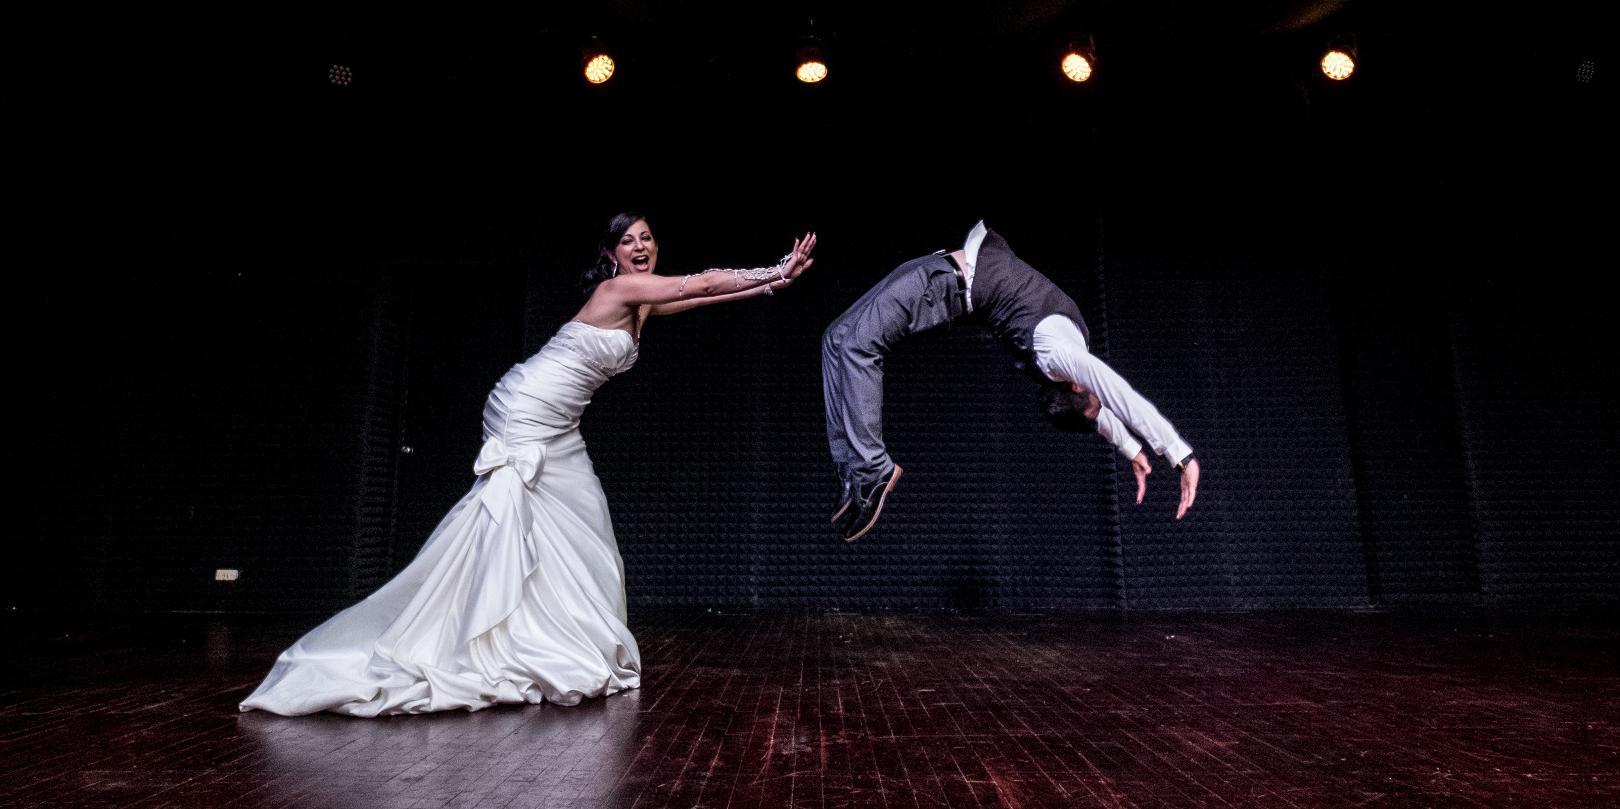 bodas-sin-clasificar-sin-tema-cuba-25831.jpg